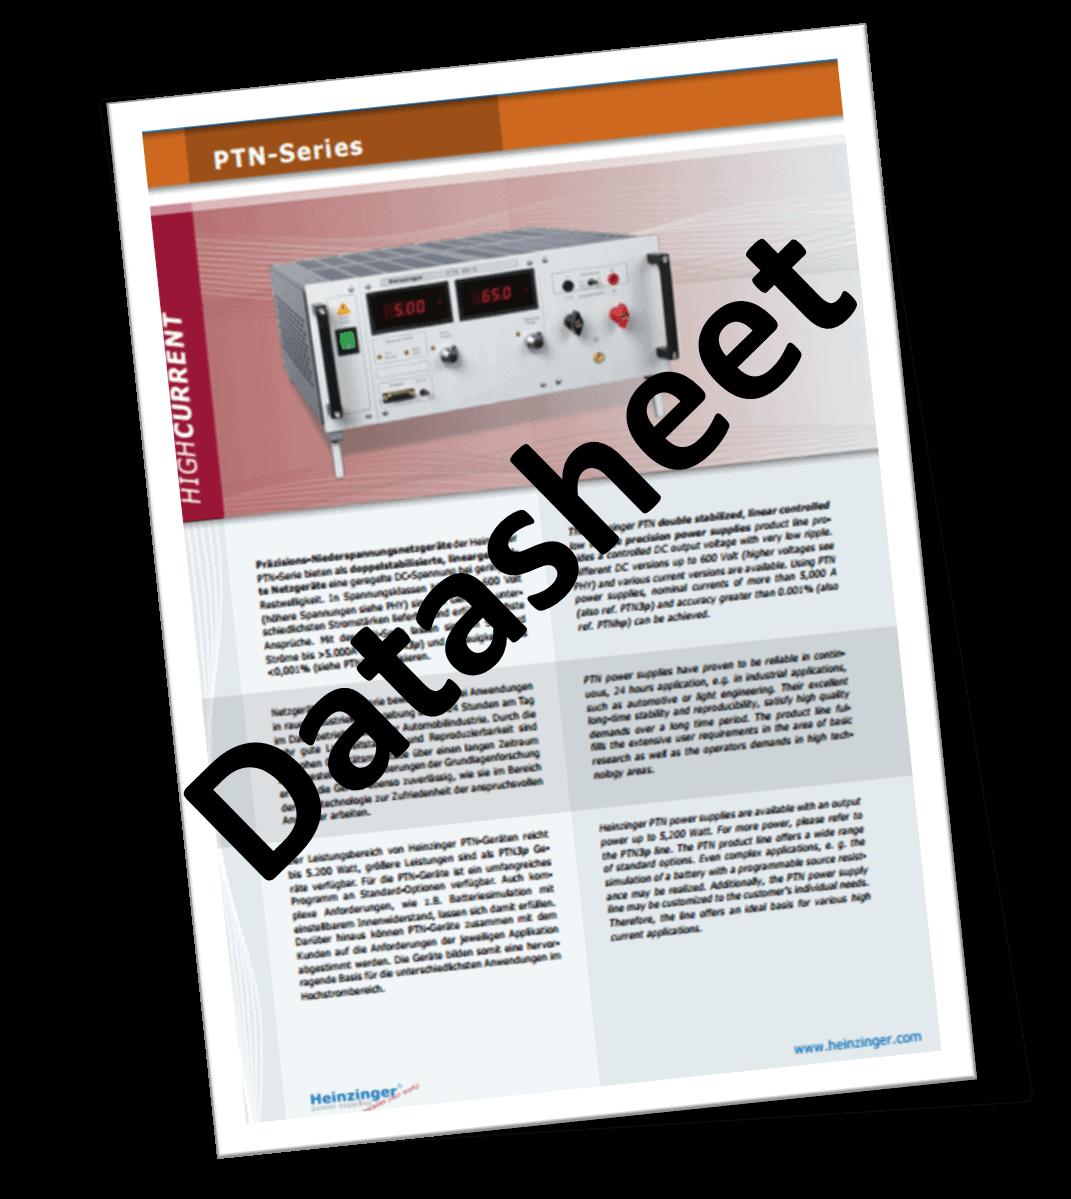 Ptn Series Datasheet Icon Pulse Power Amp Measurement Ltd